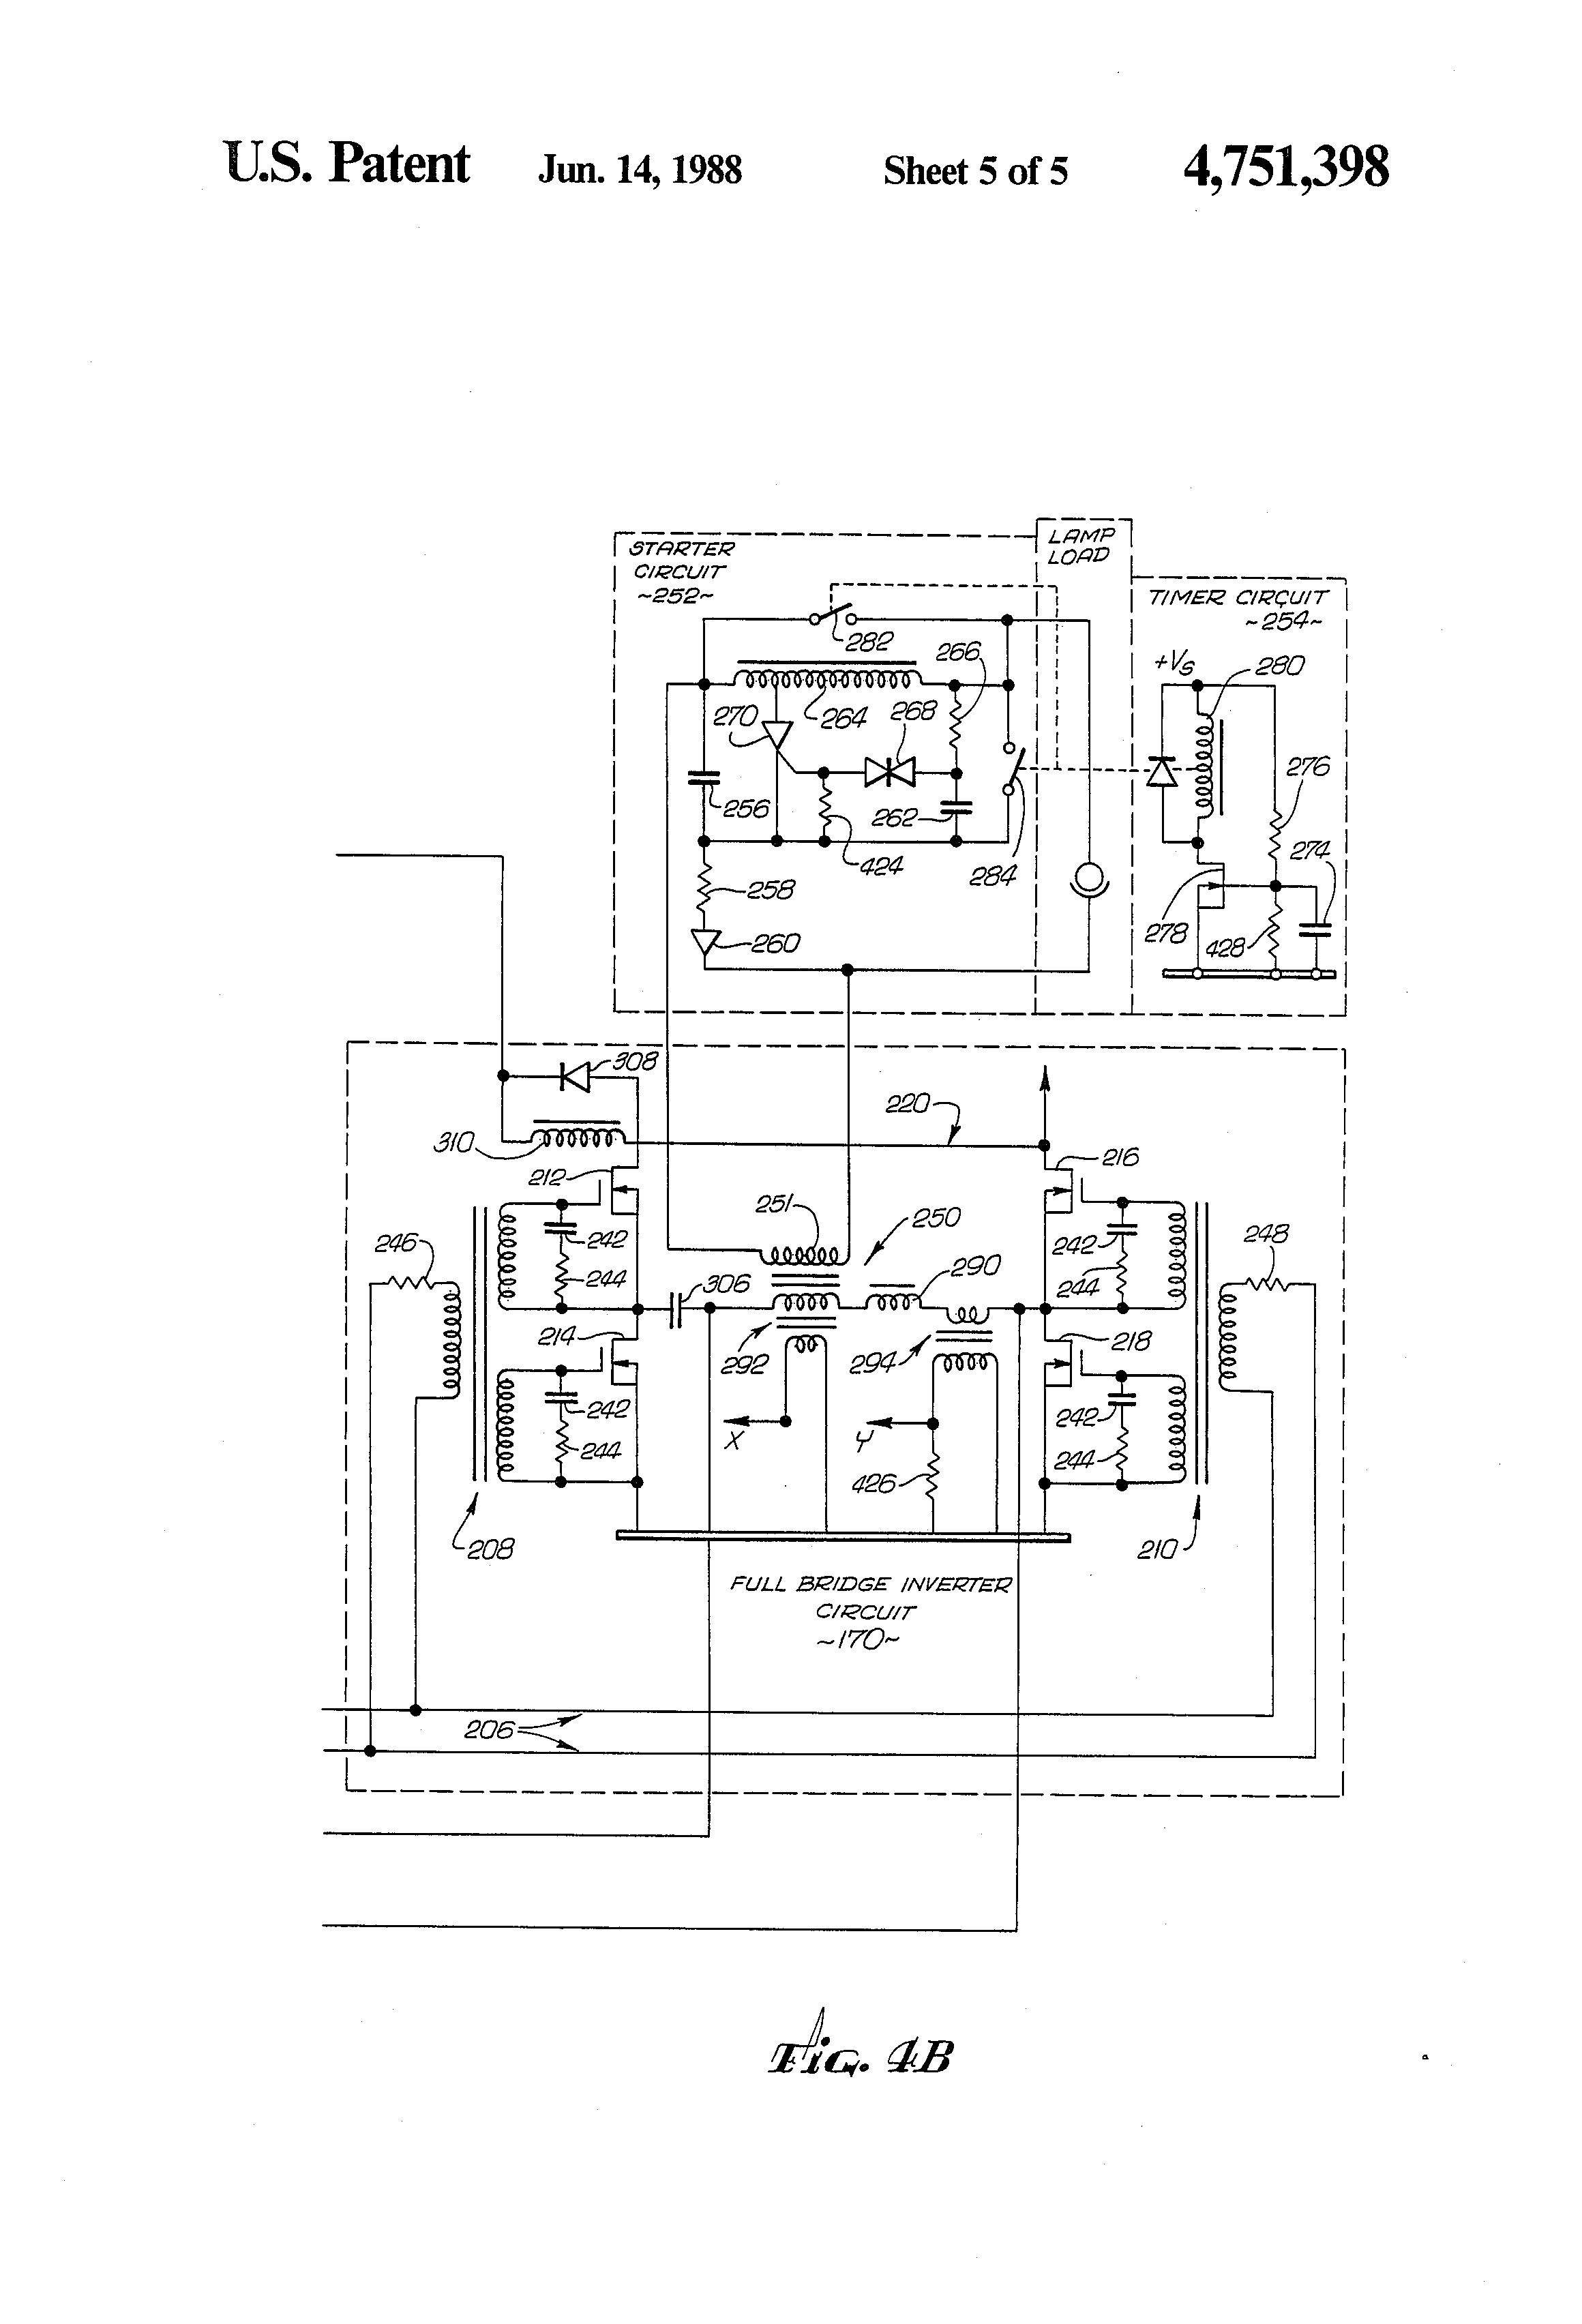 Metal Halide Lamp Wiring Diagram from detoxicrecenze.com